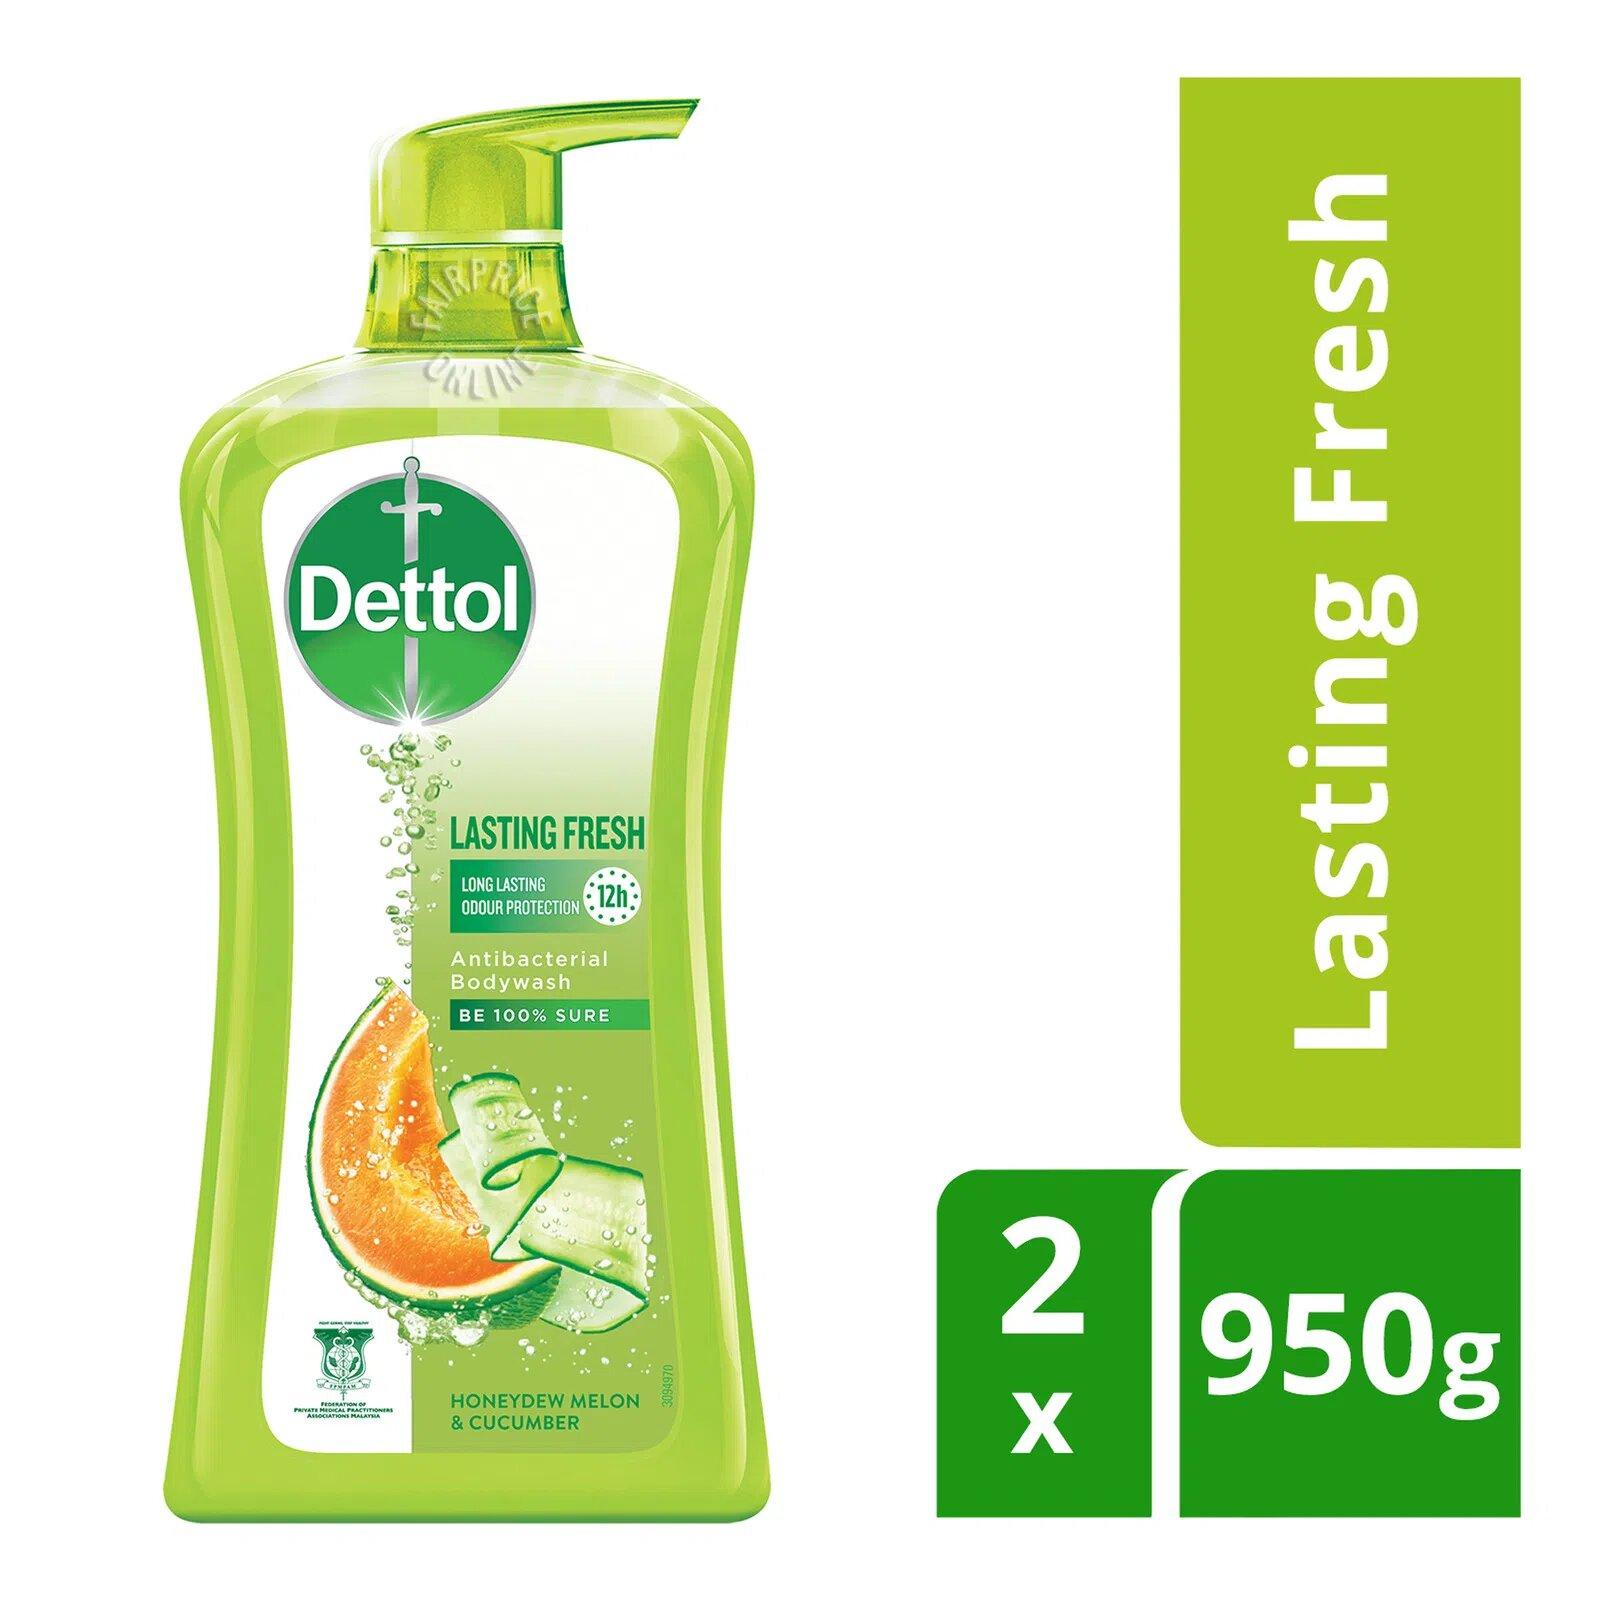 Dettol Anti-Bacterial pH-Balanced Body Wash - Lasting Fresh